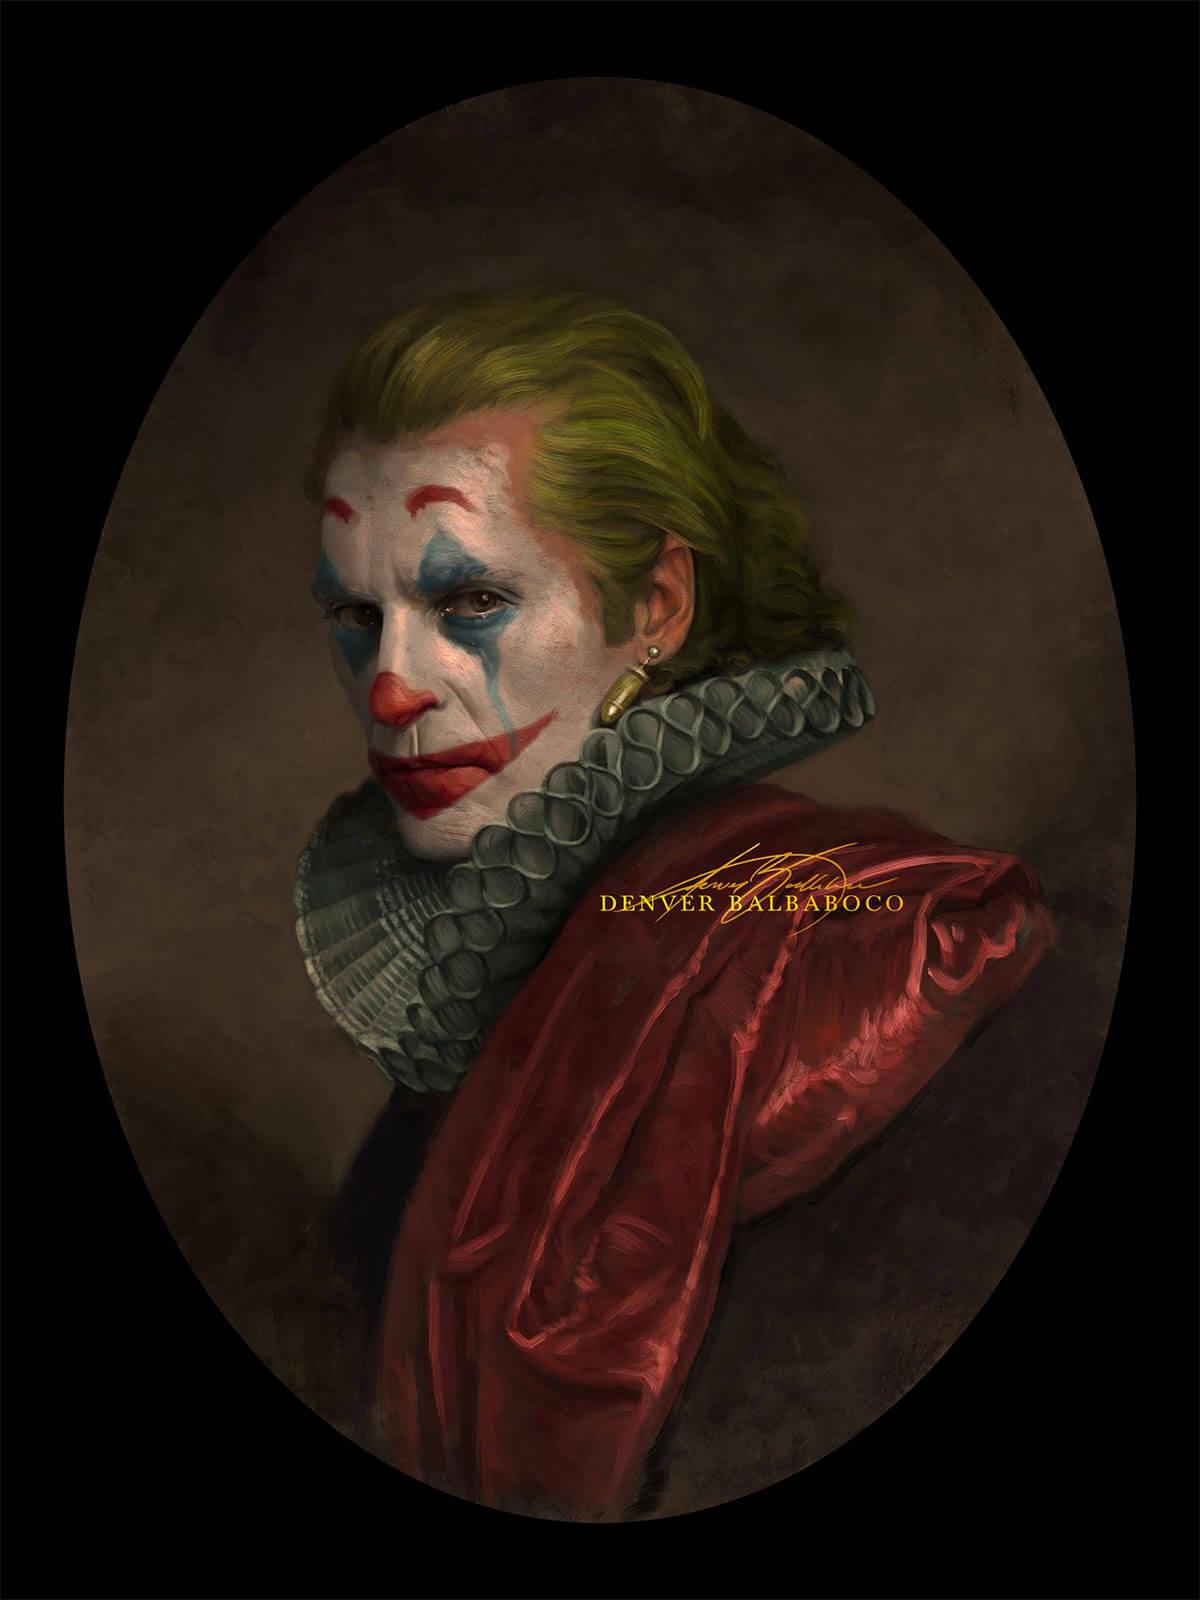 Prince Joker by Denver Balbaboco